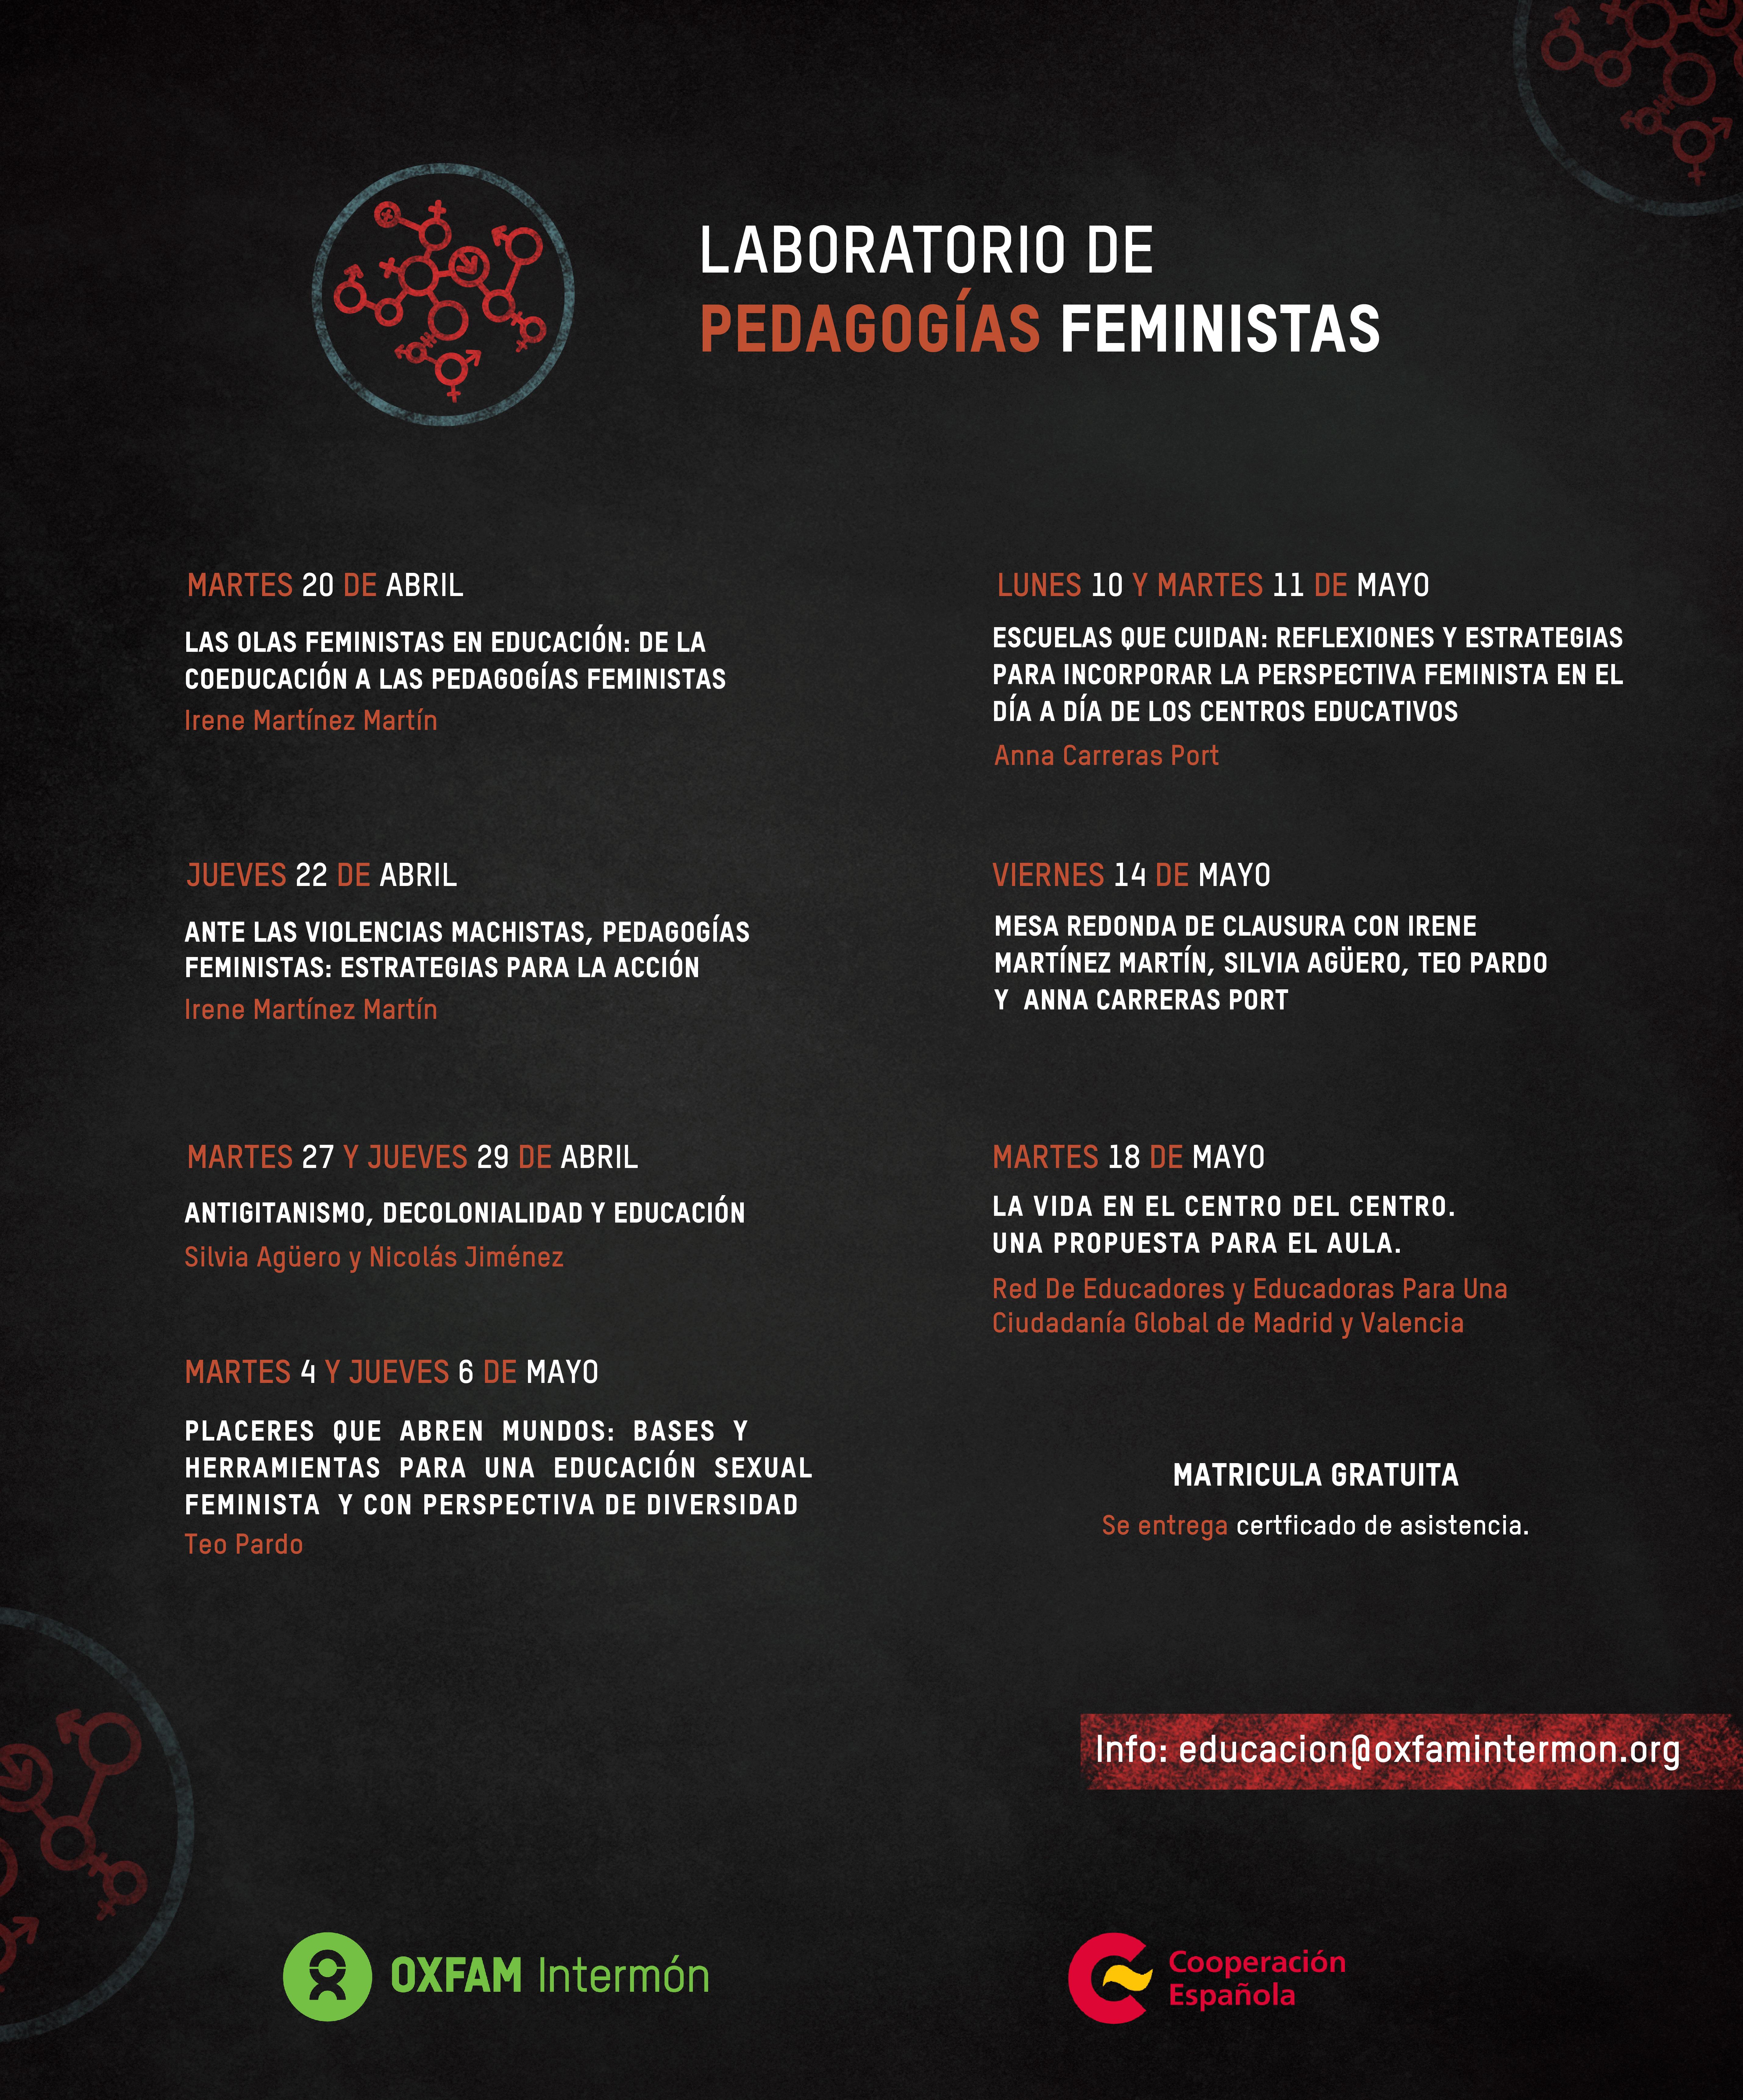 laboratorio de pedagogías feministas programa